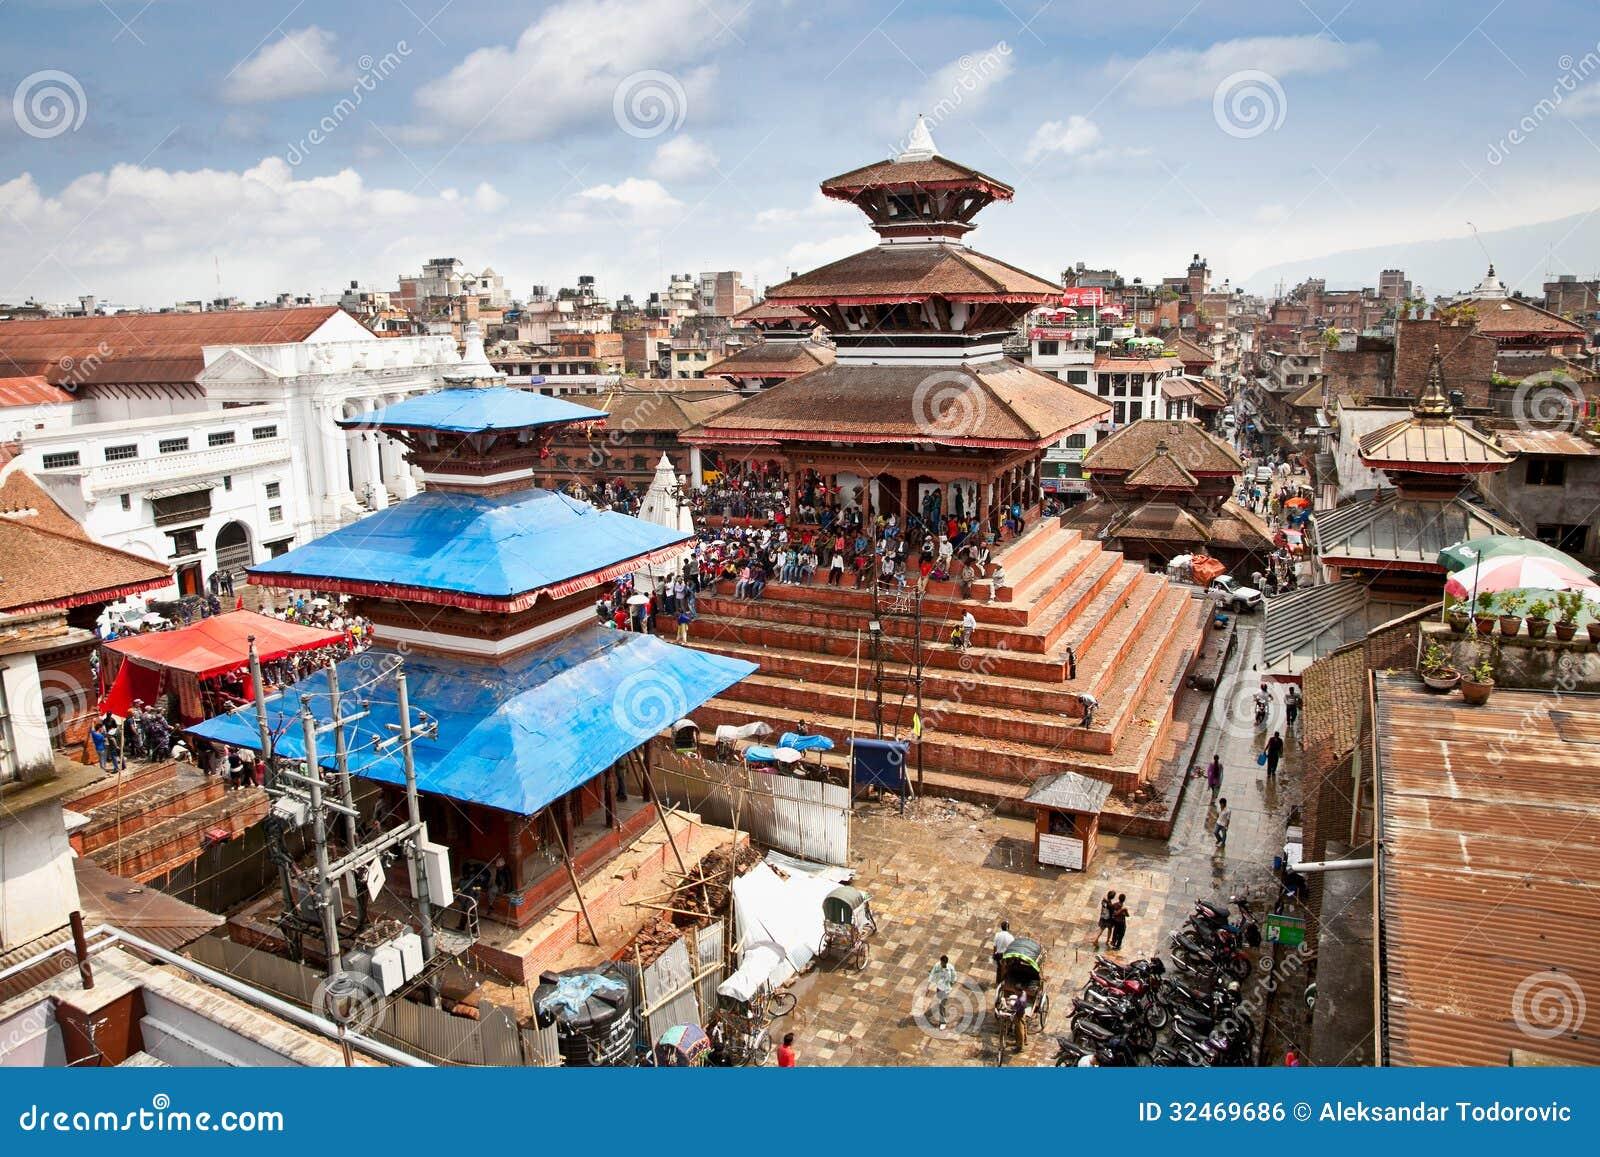 AdultFriendFinder Free Sex Dating in Kathmandu Madhya Pashchimanchal